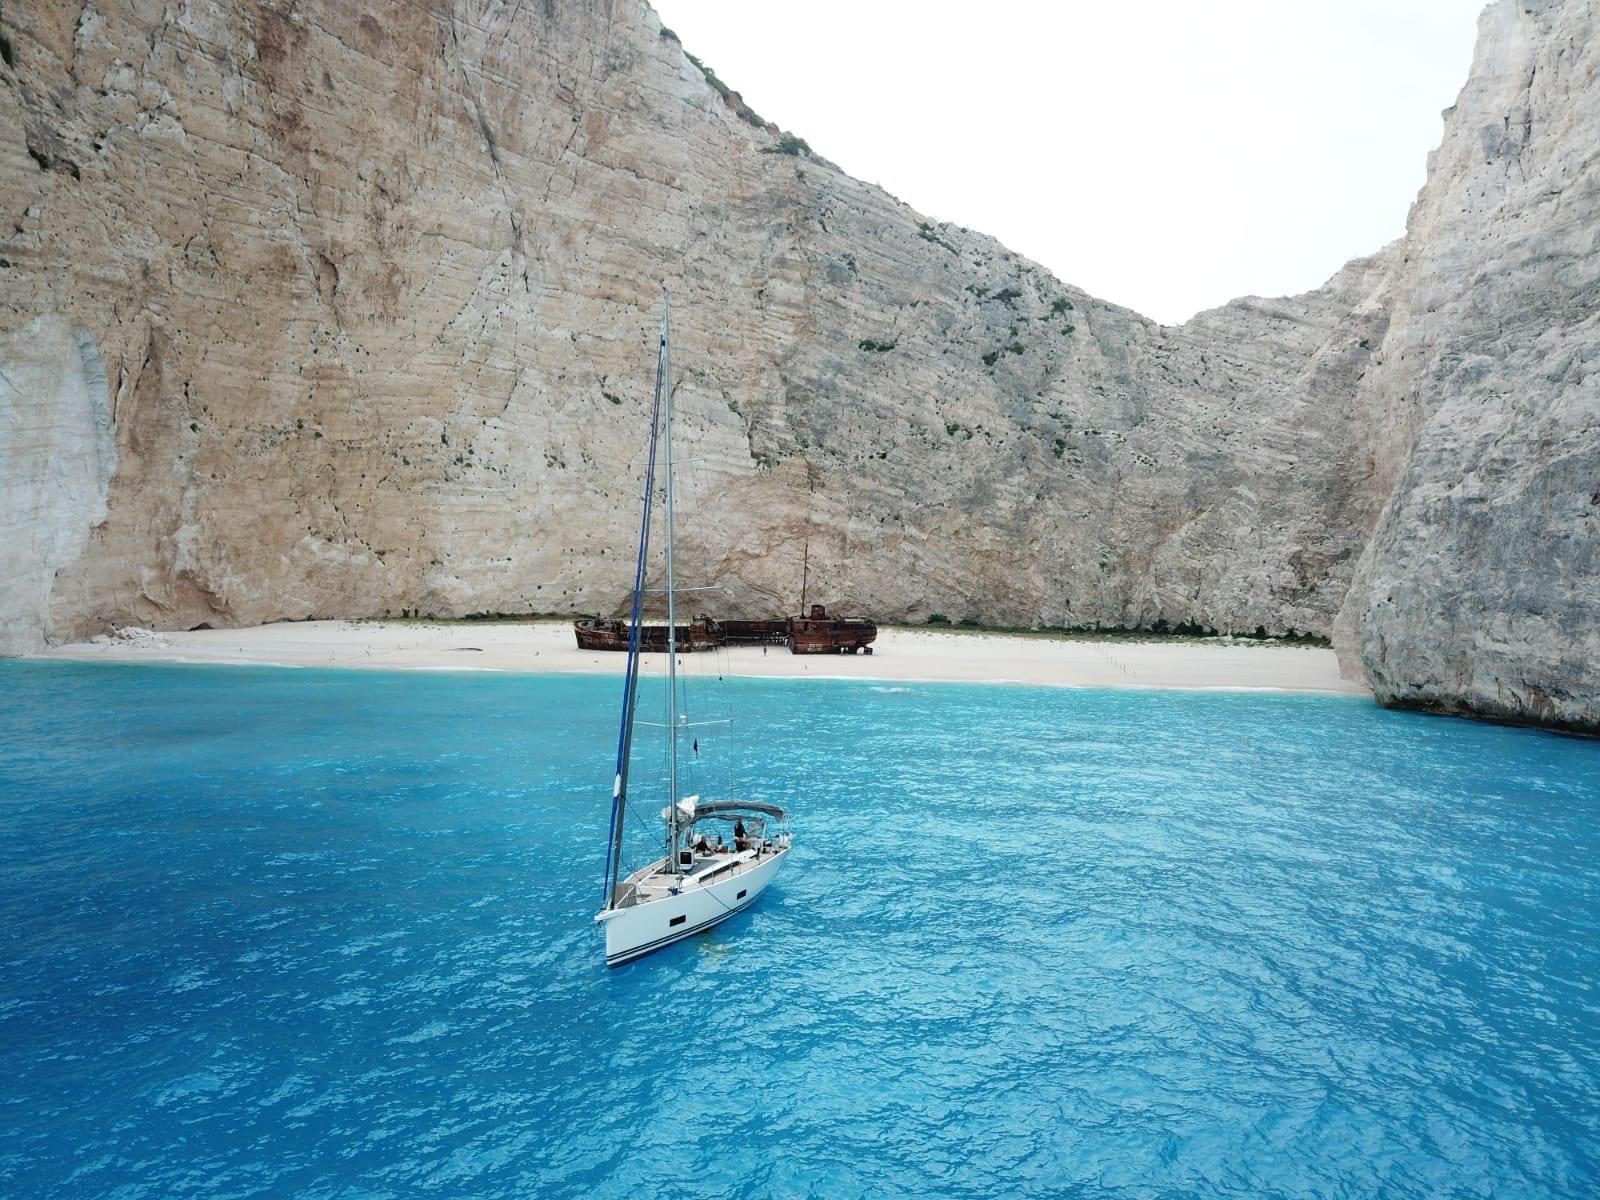 Solaris47 Fastsailing Charter Ionian Sea